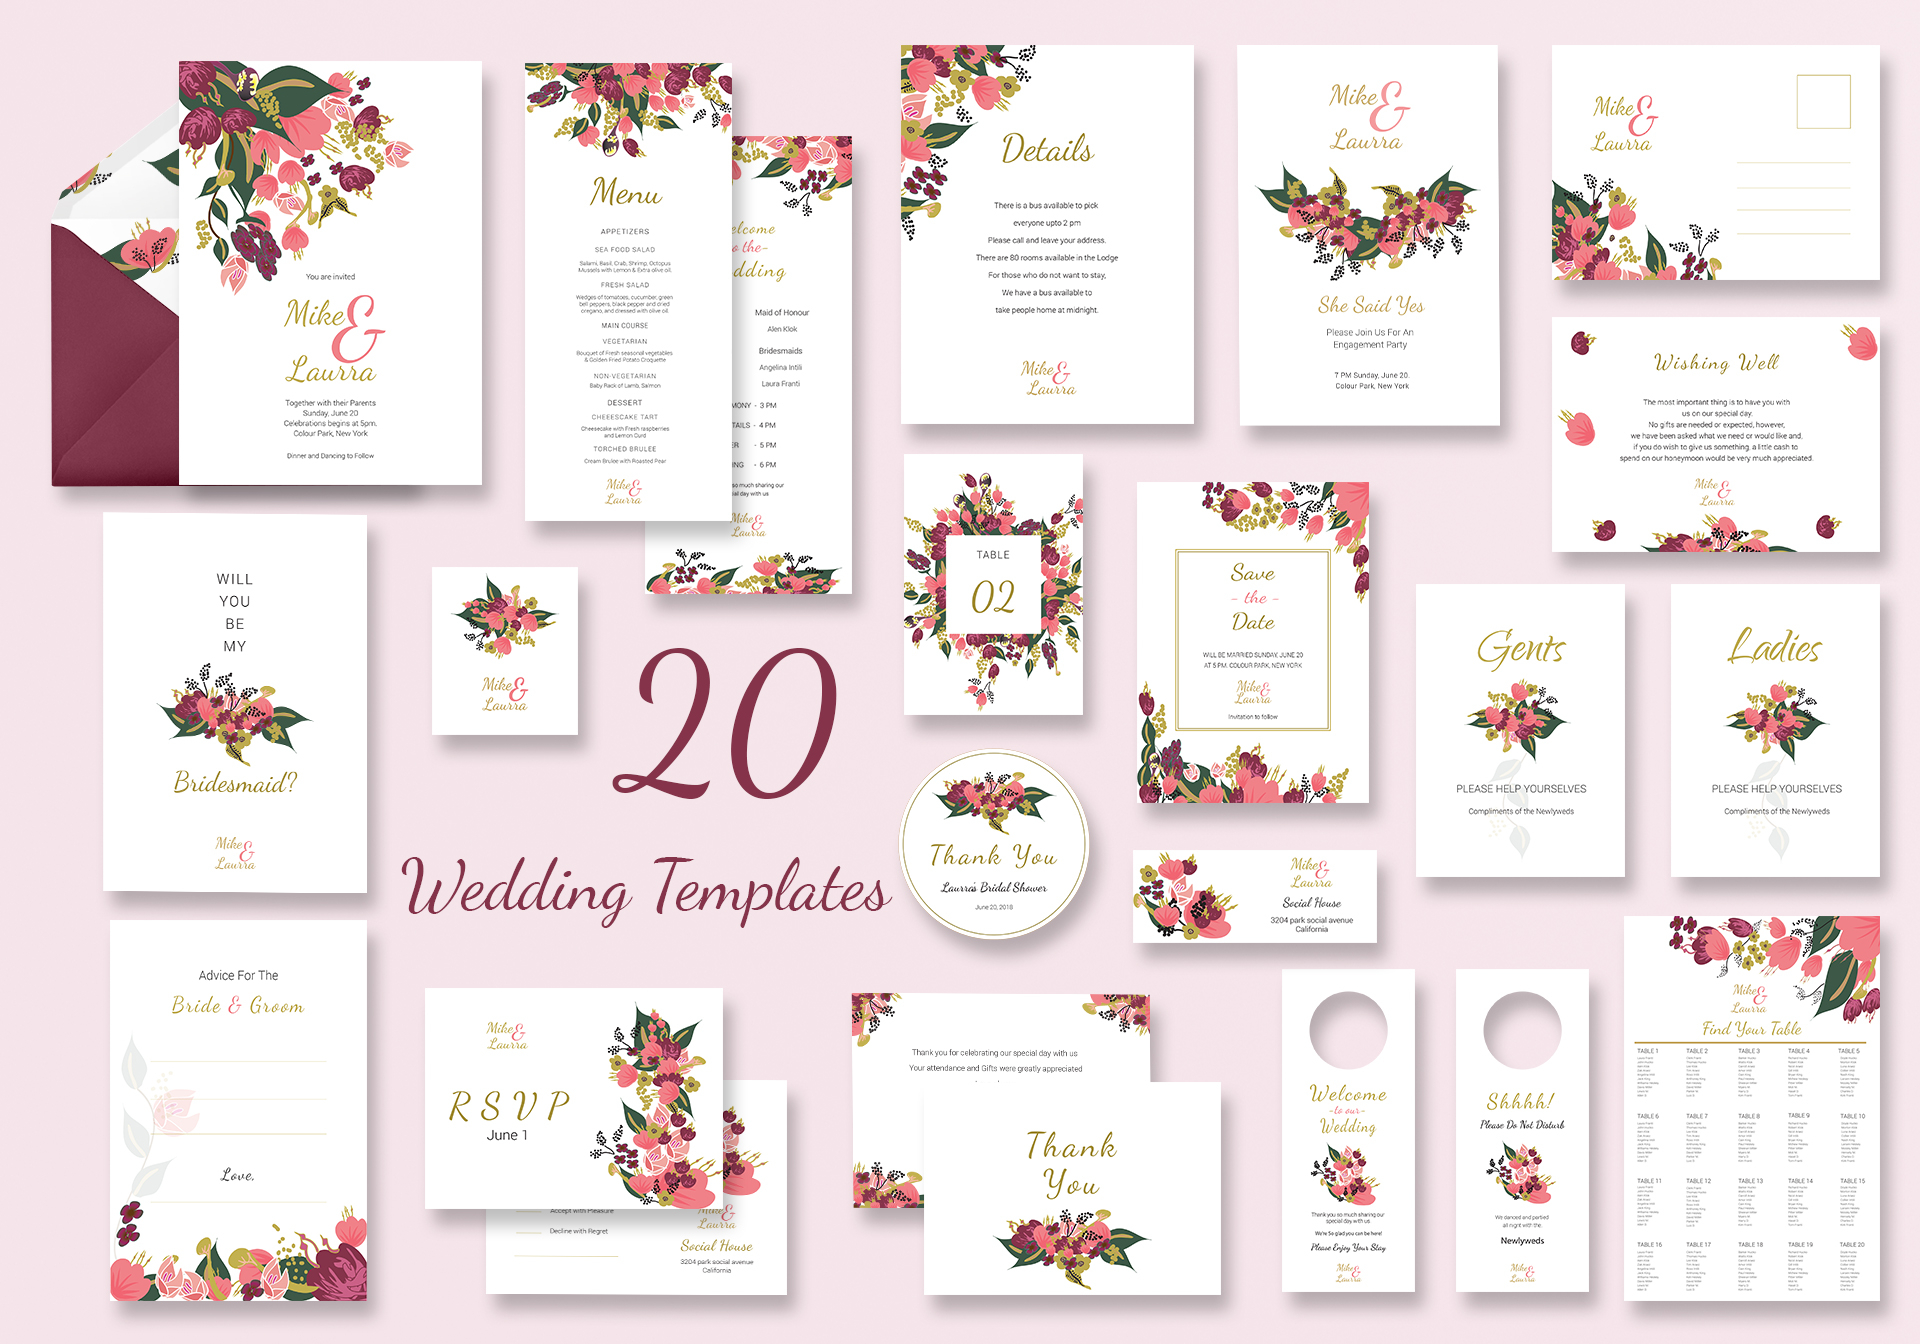 Burgundy Floral Wedding Templates